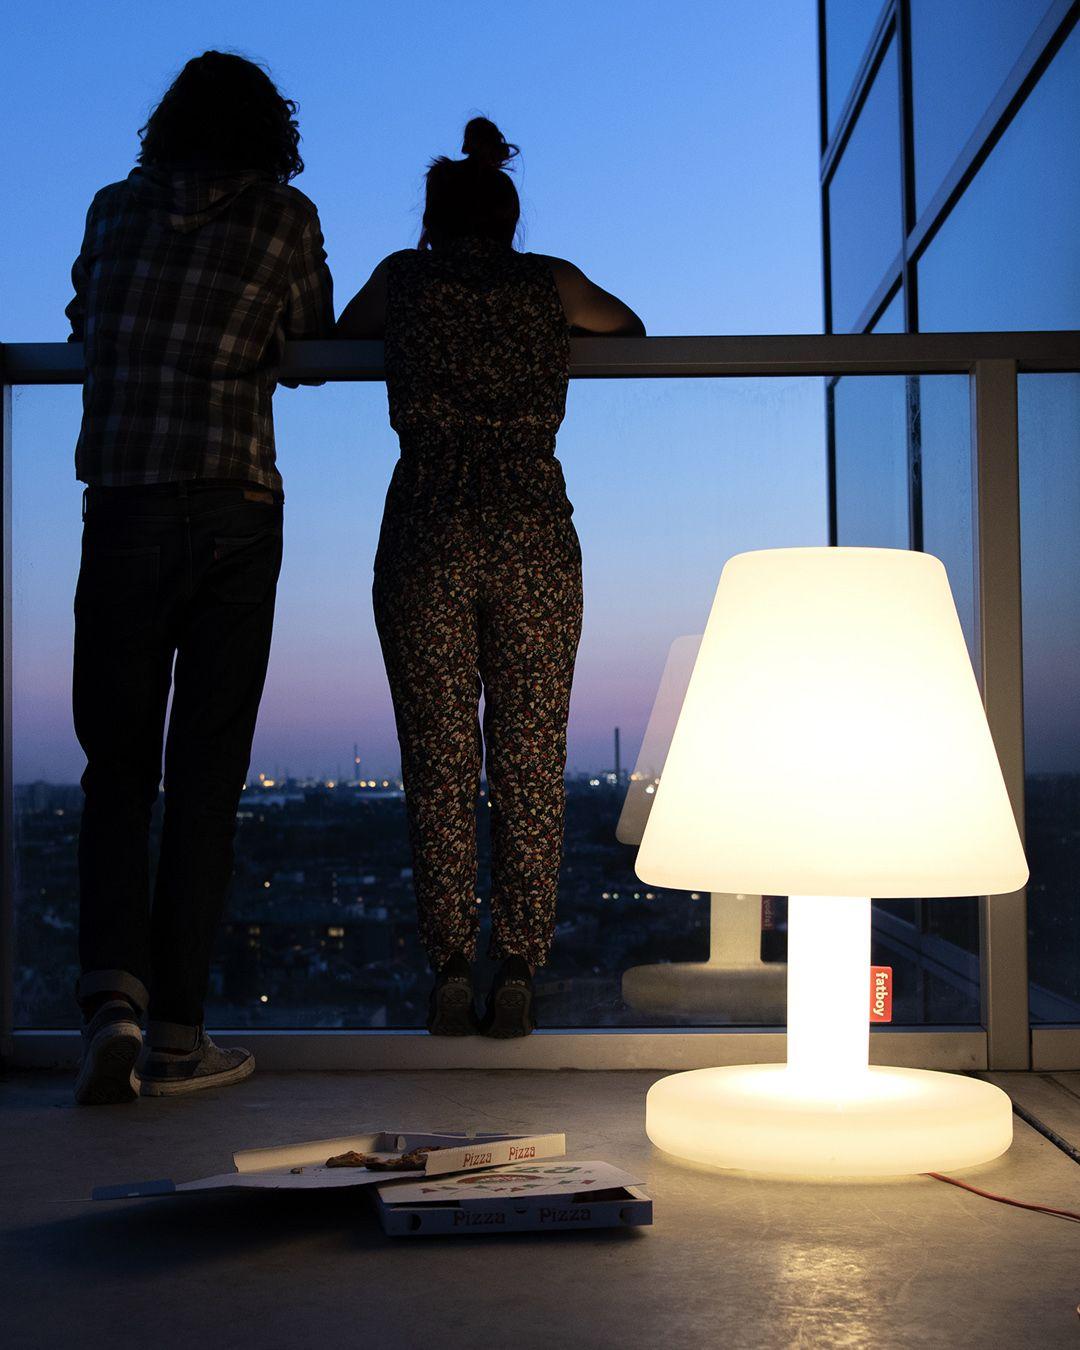 New The 10 Best Home Decor With Pictures Edison The Grand Para Espacios Exteriores E Interiores Decor Interior Design Real Estate Houses Design Studio